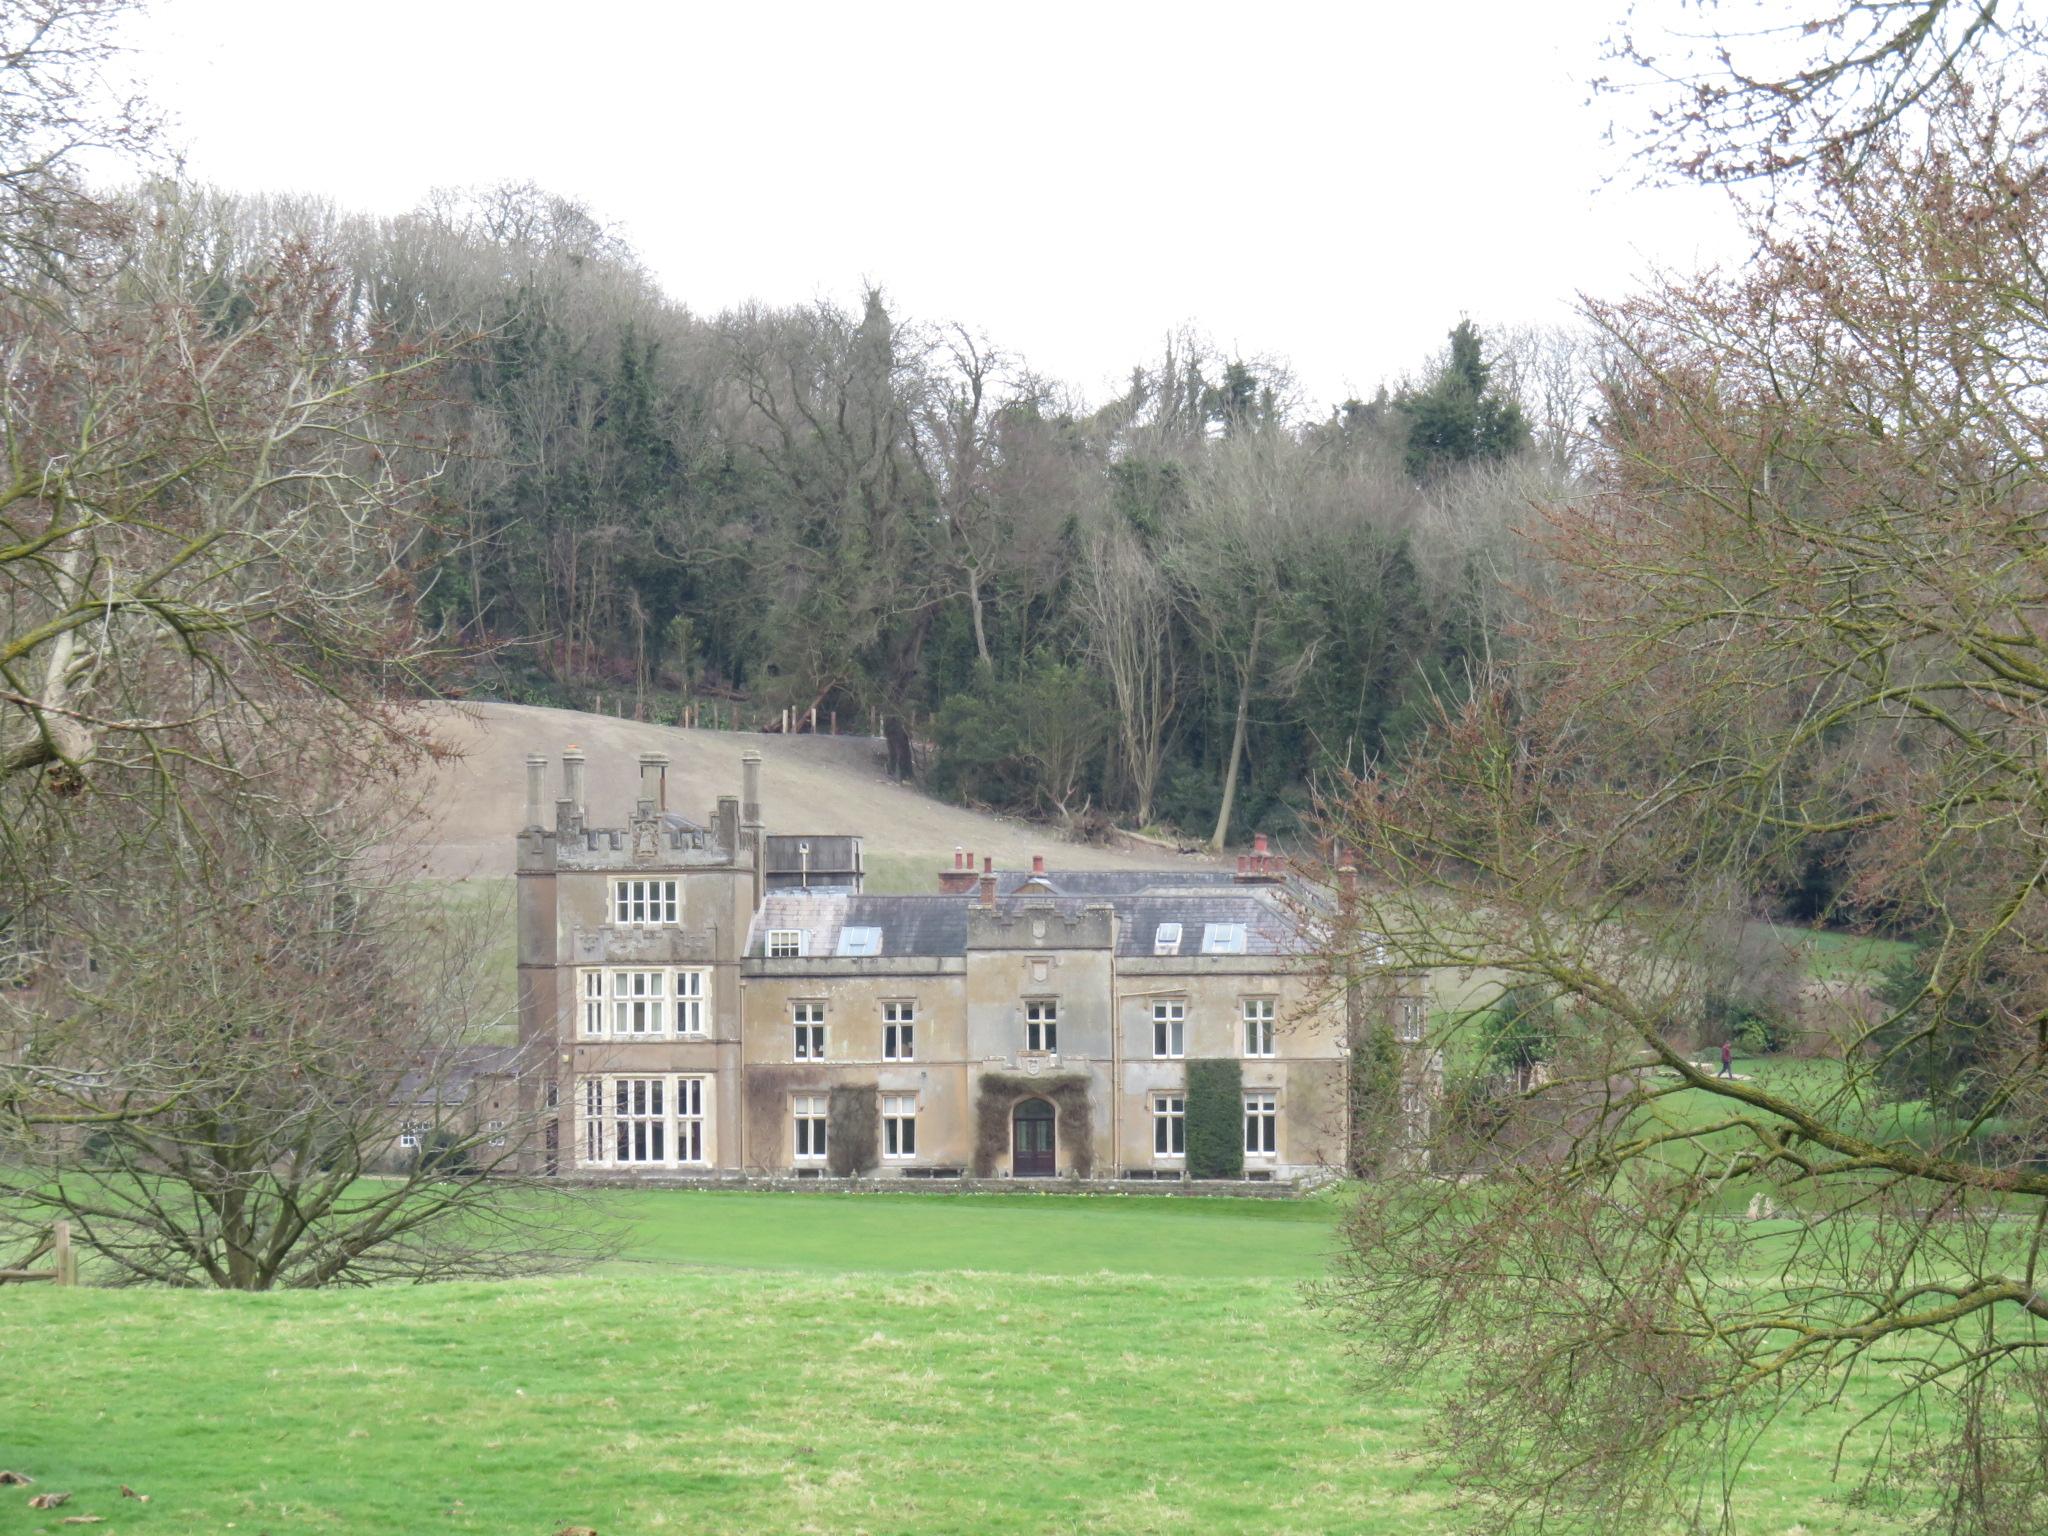 Country Estate, Surrey - Extension